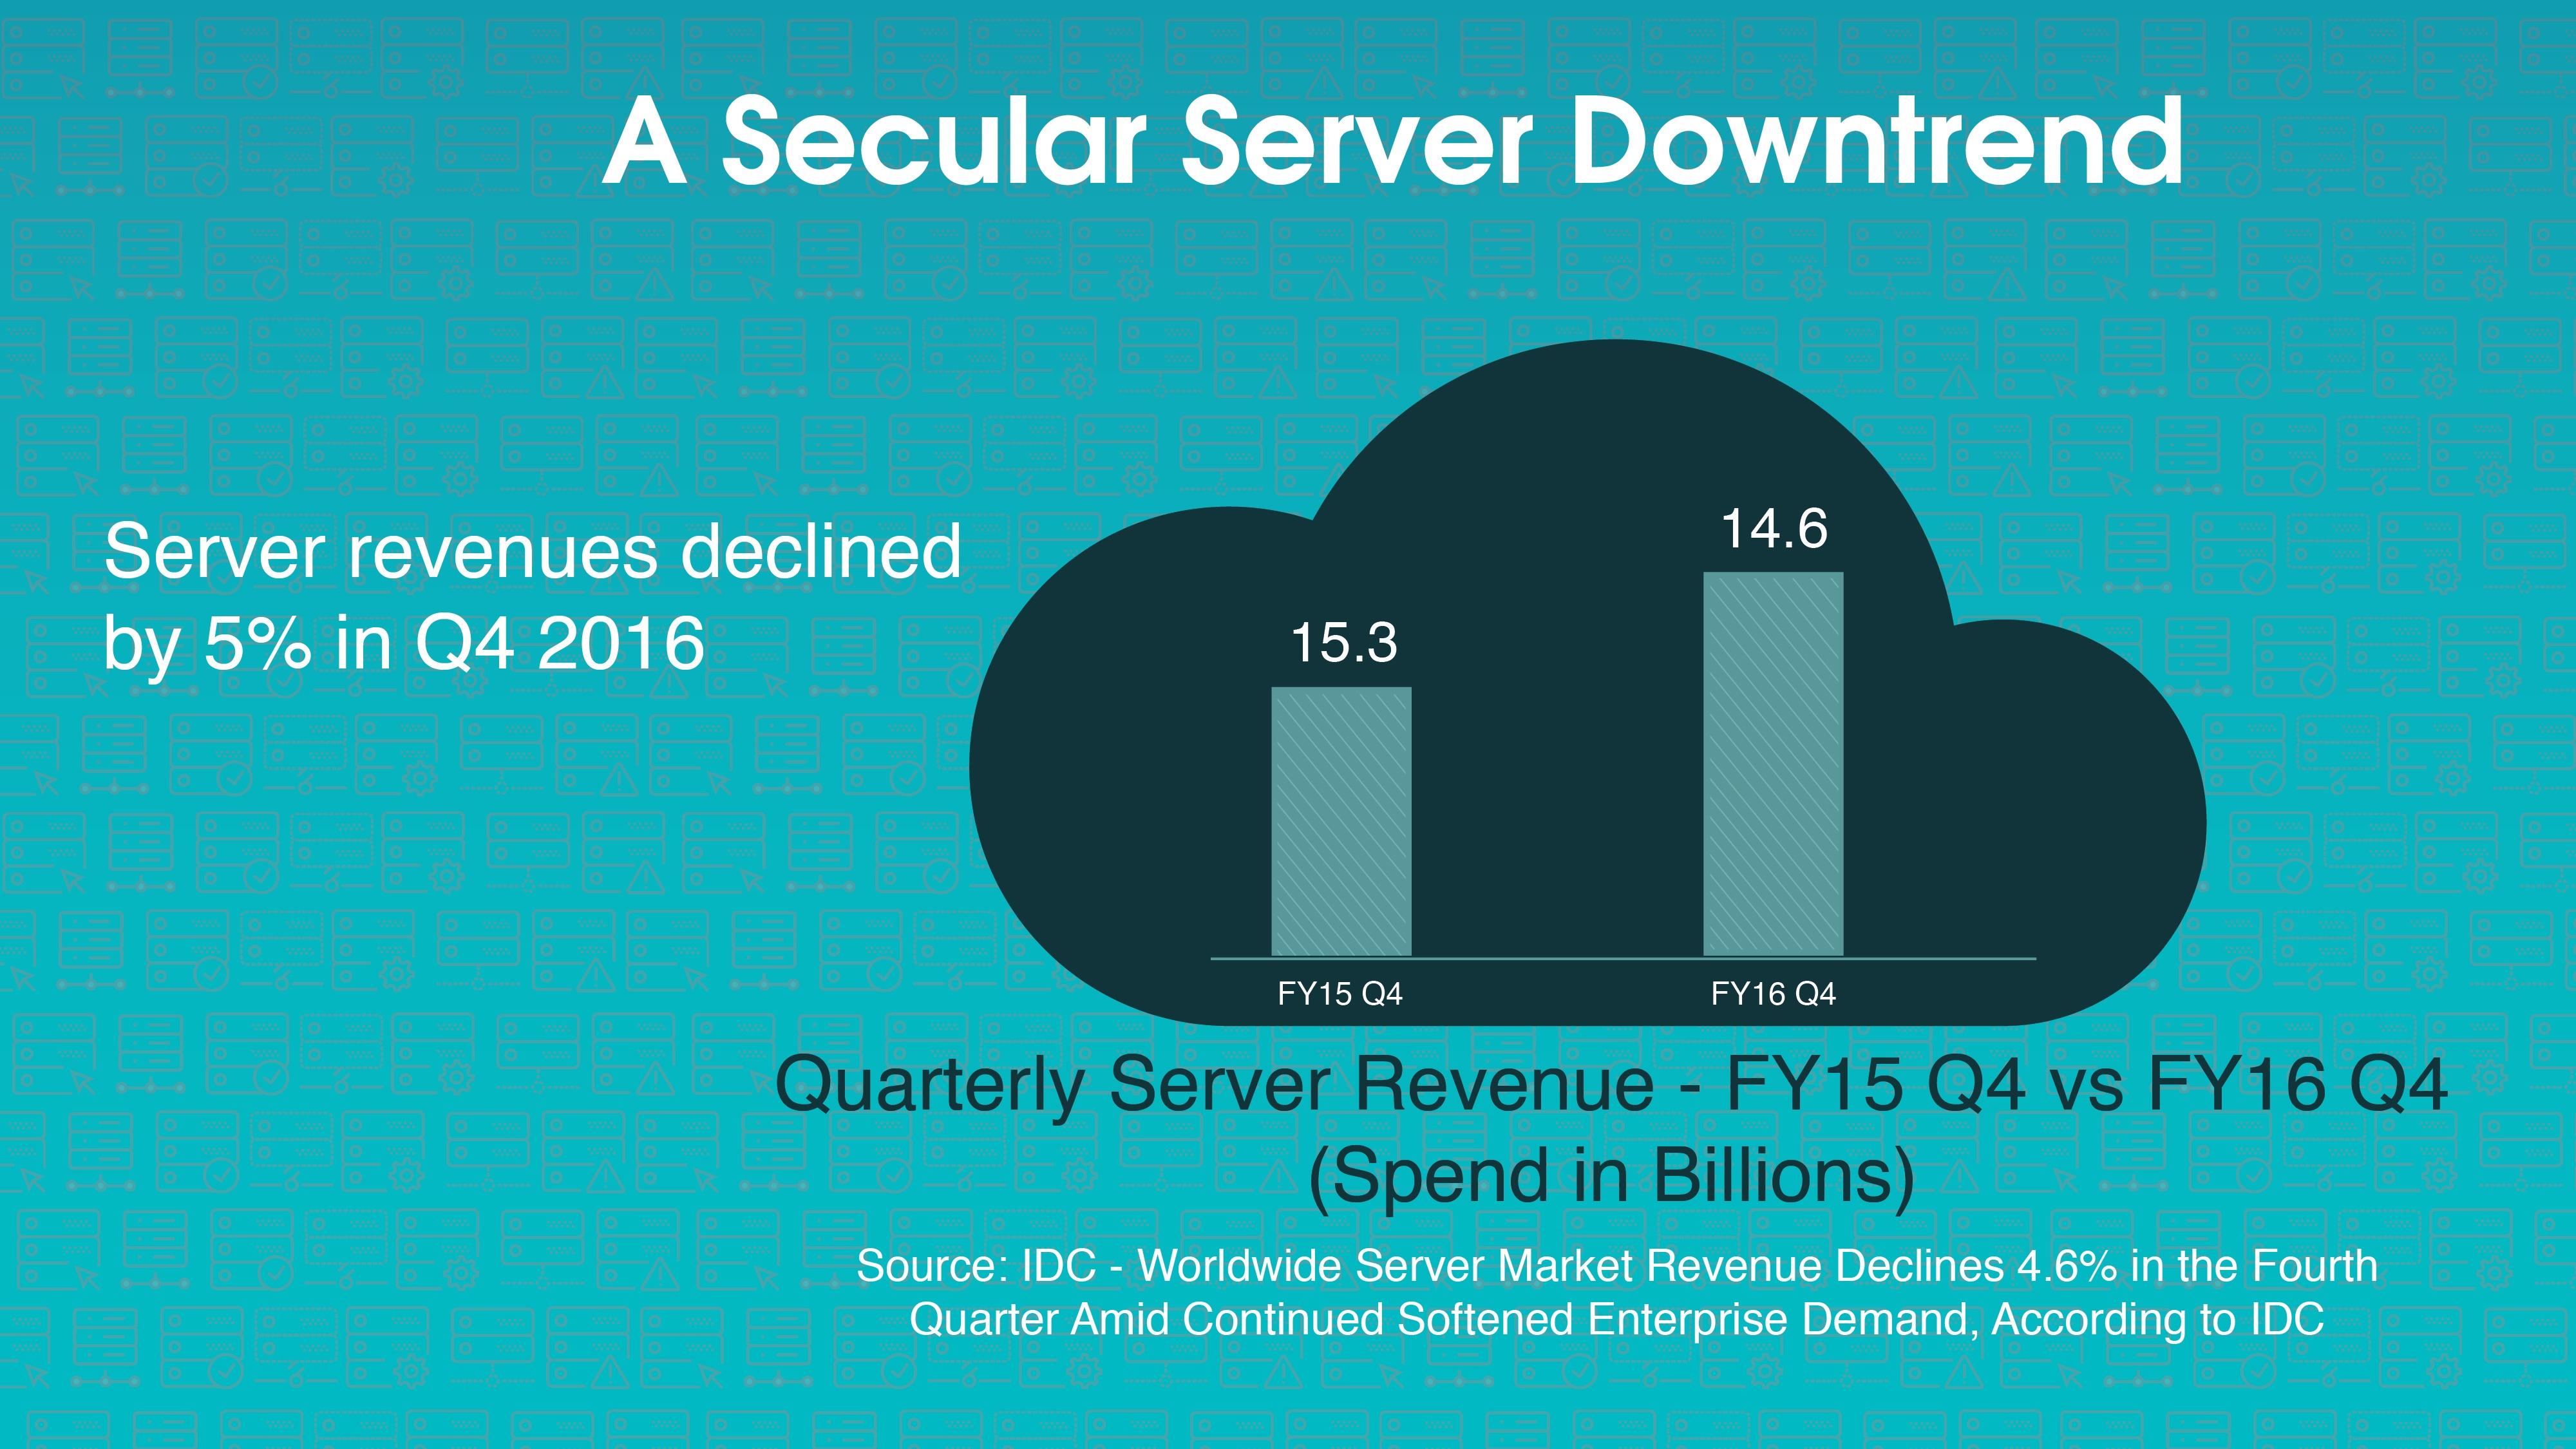 A Secular Server Downtrend